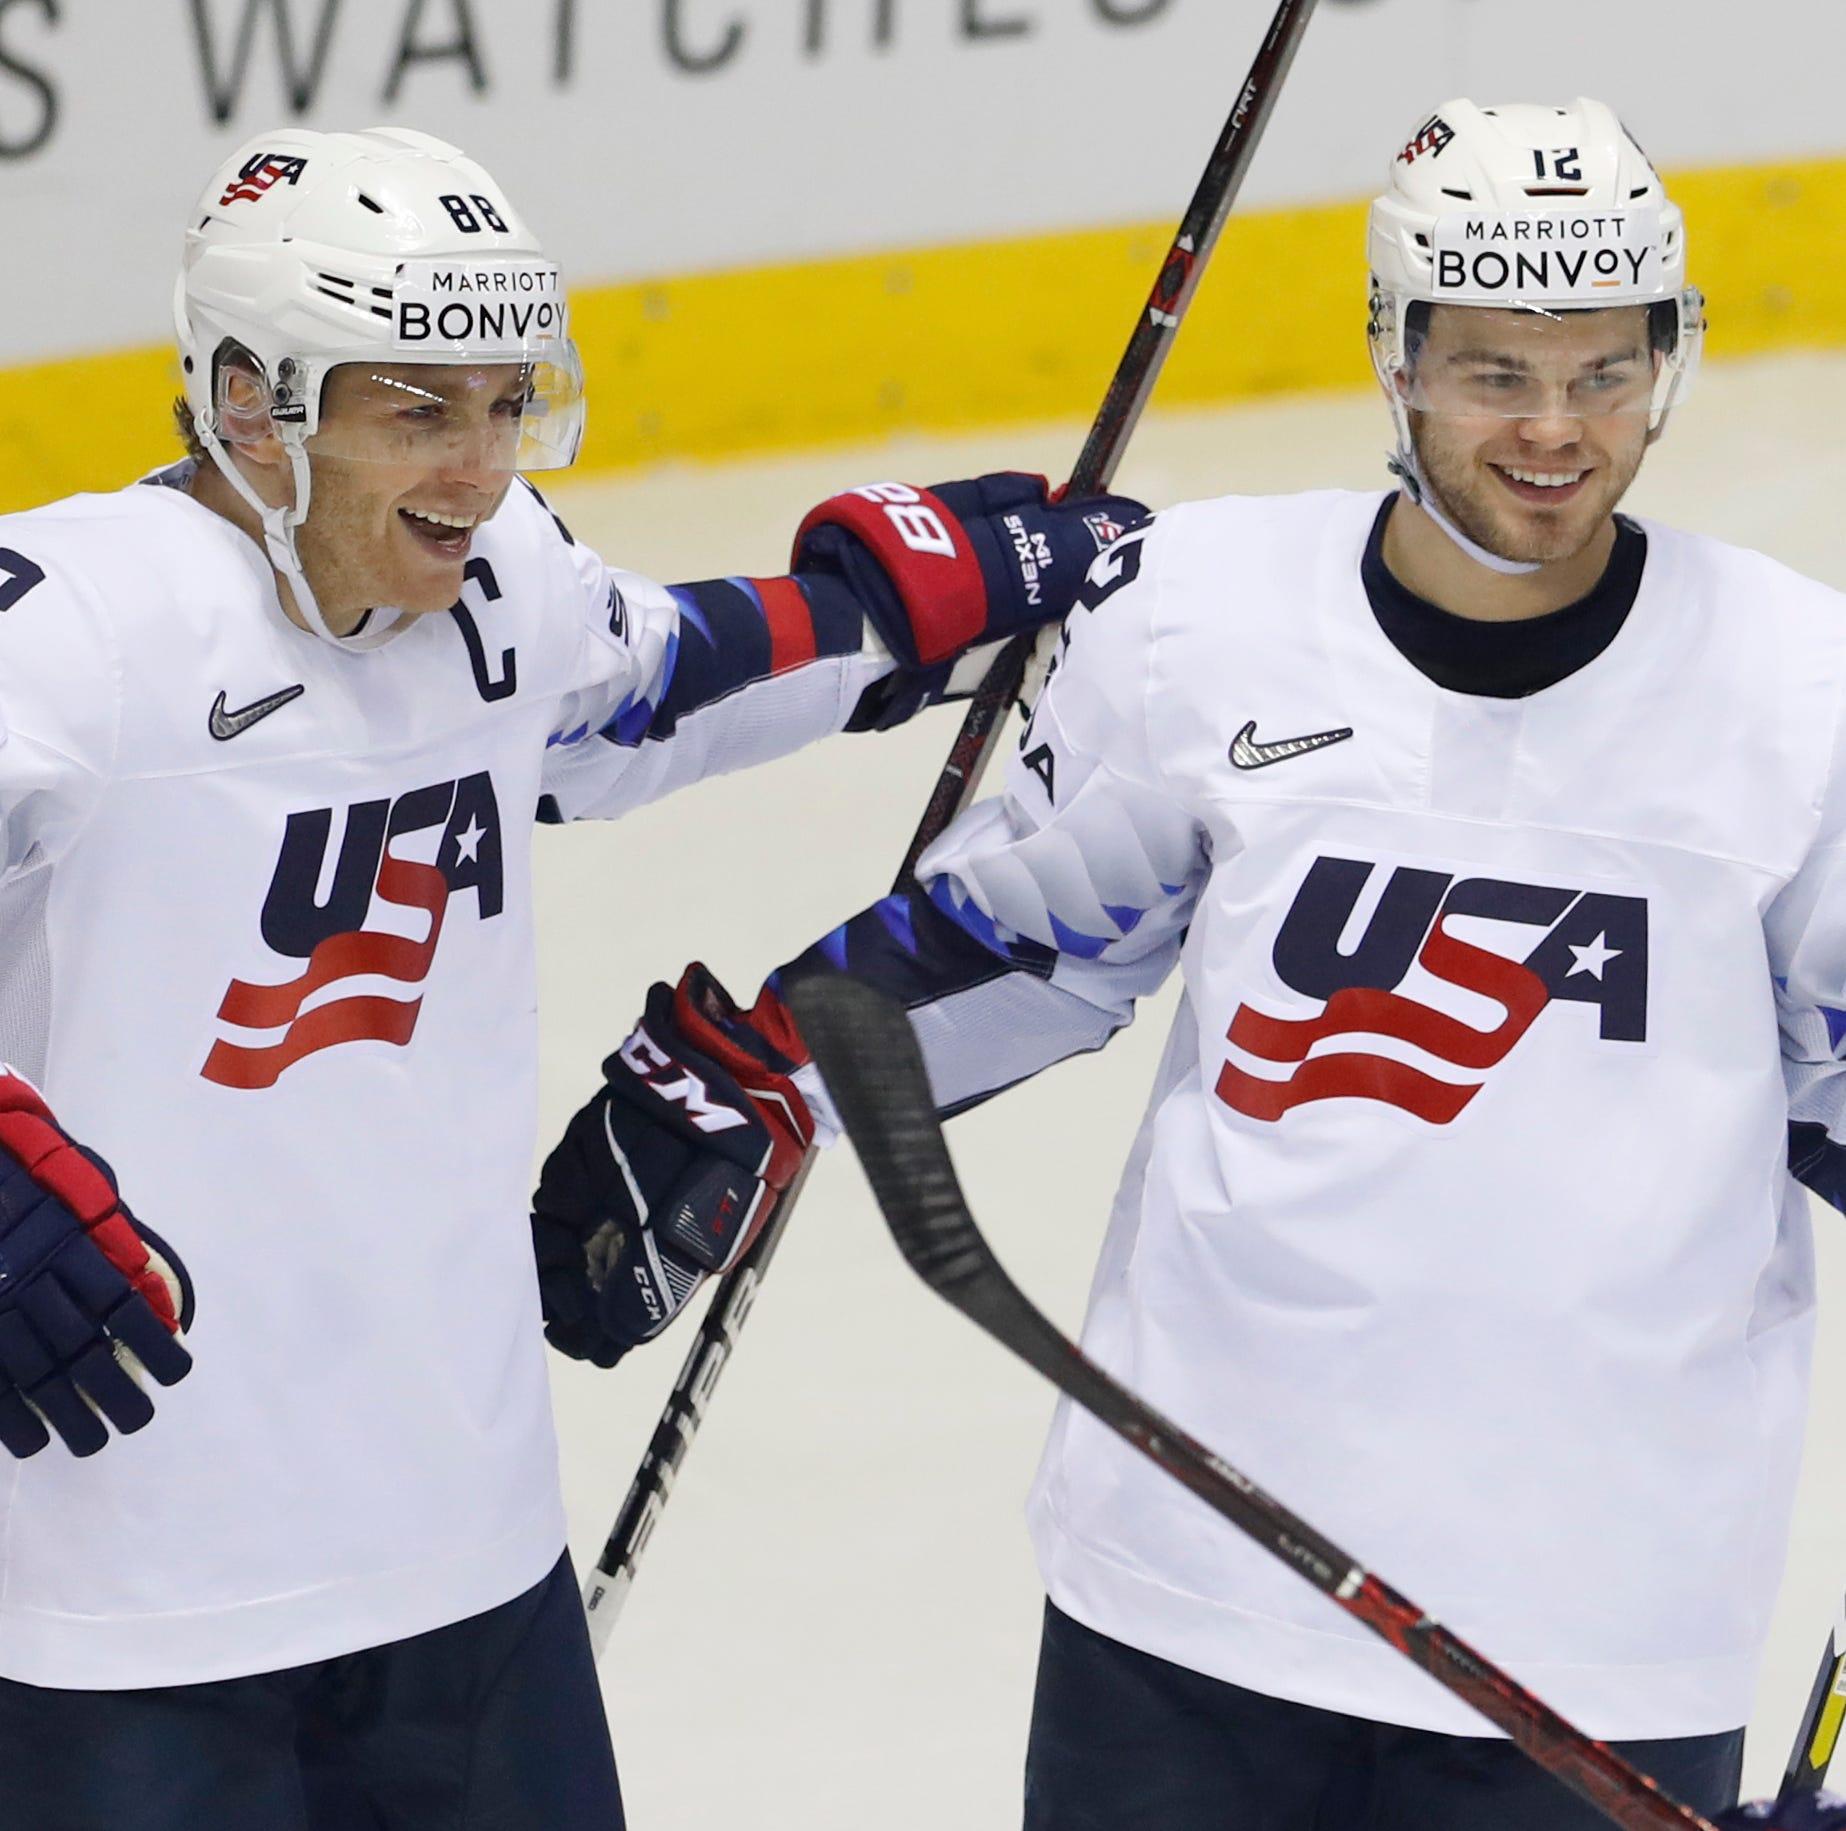 Saturday's world hockey: Blashill sets all-time win mark, U.S. routs Denmark